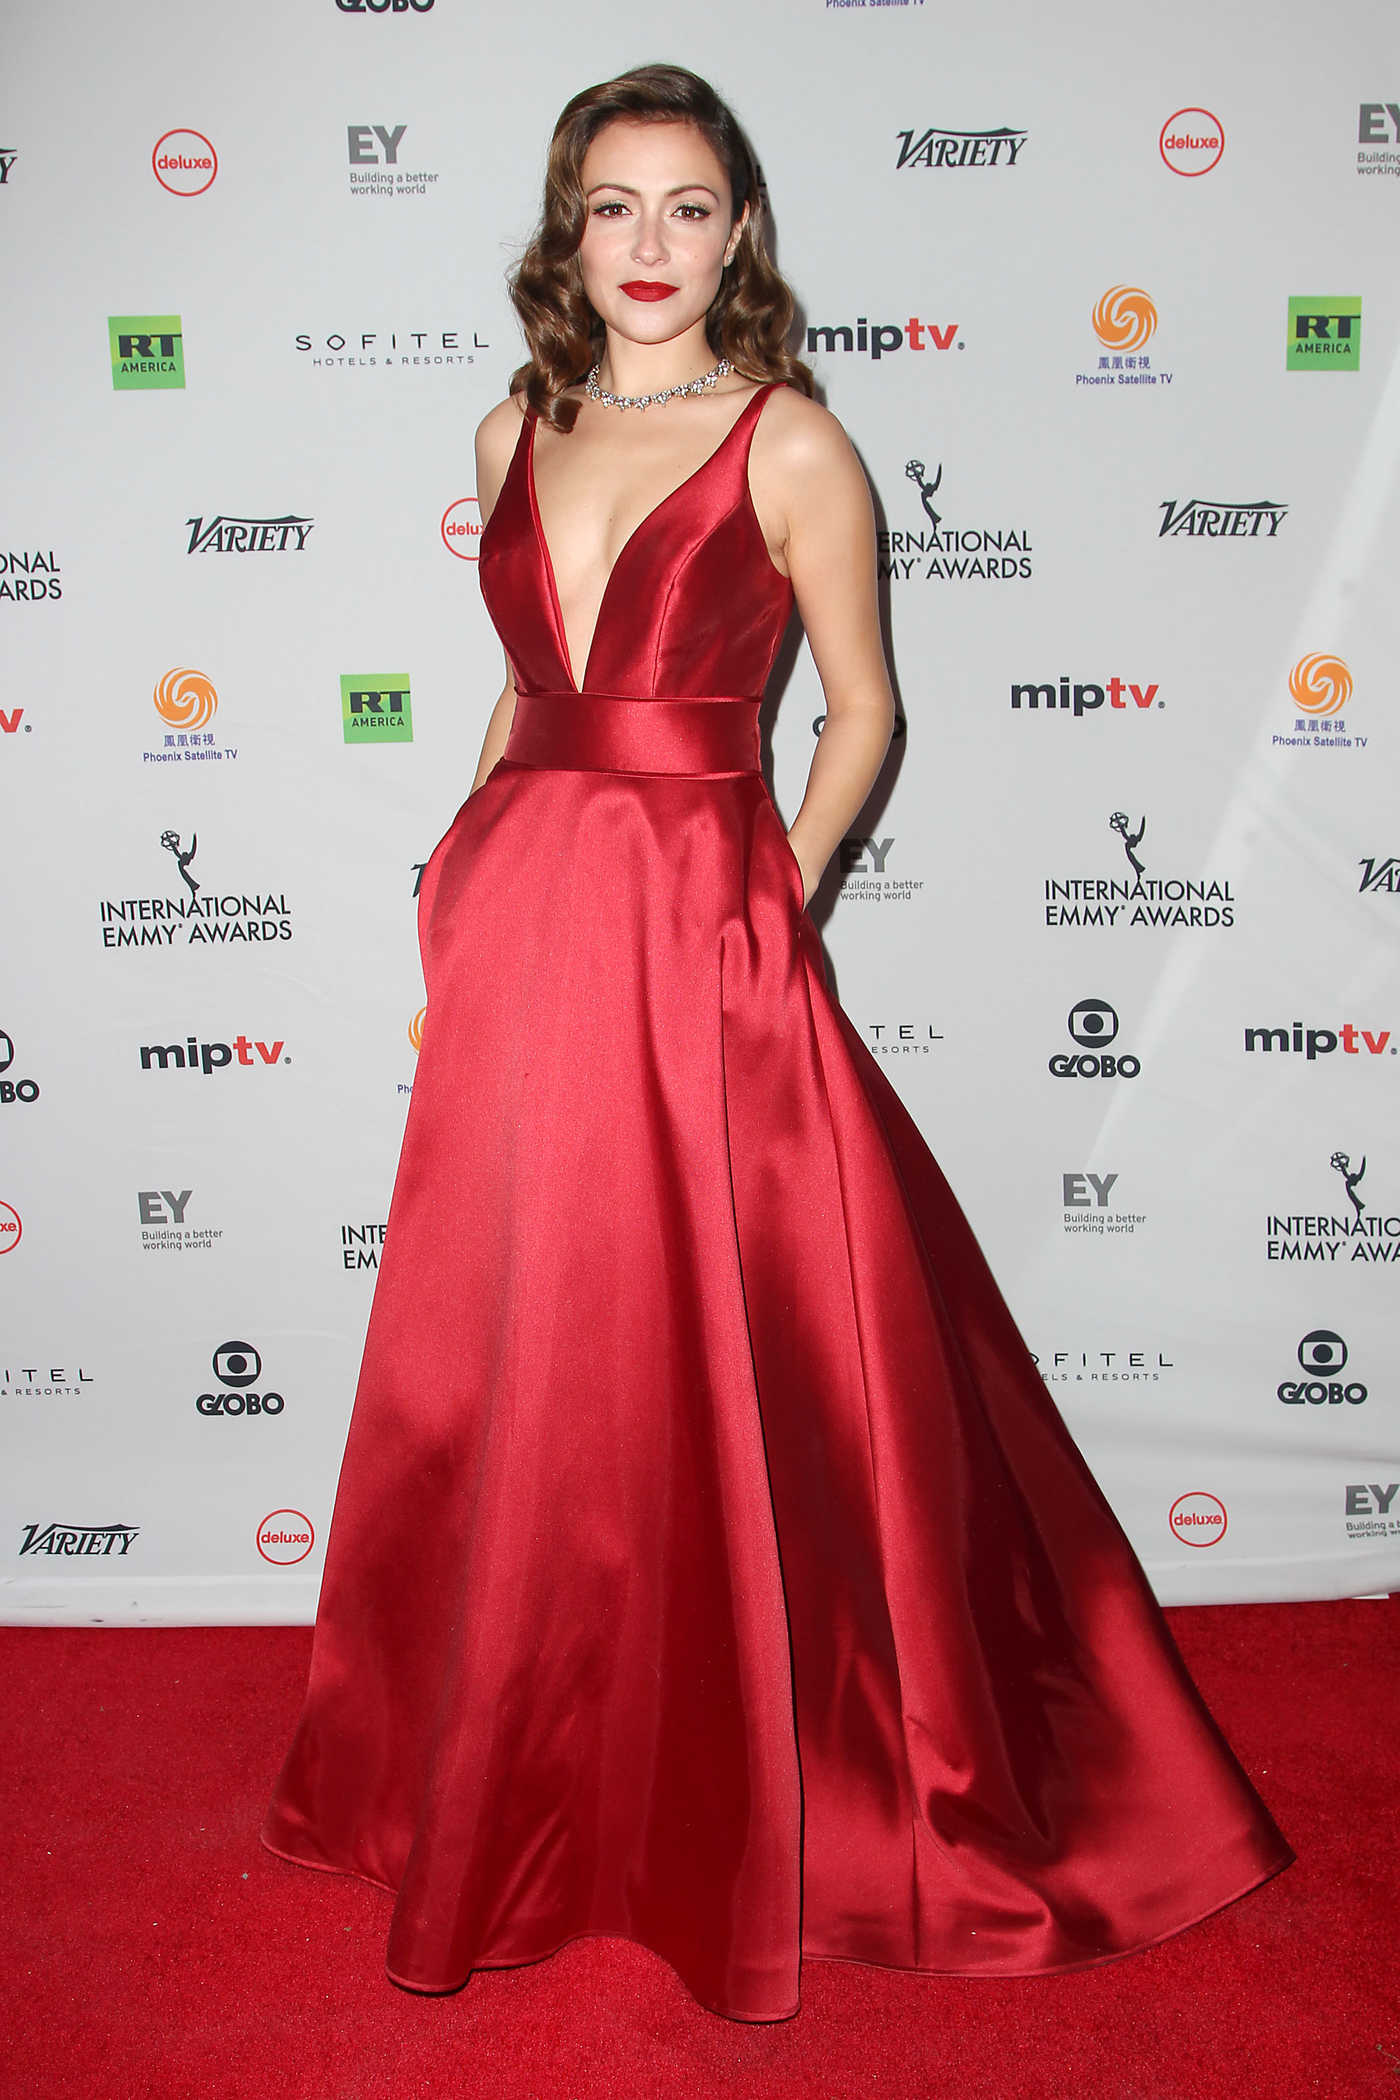 Italia Ricci at the 45th International Emmy Awards Gala at